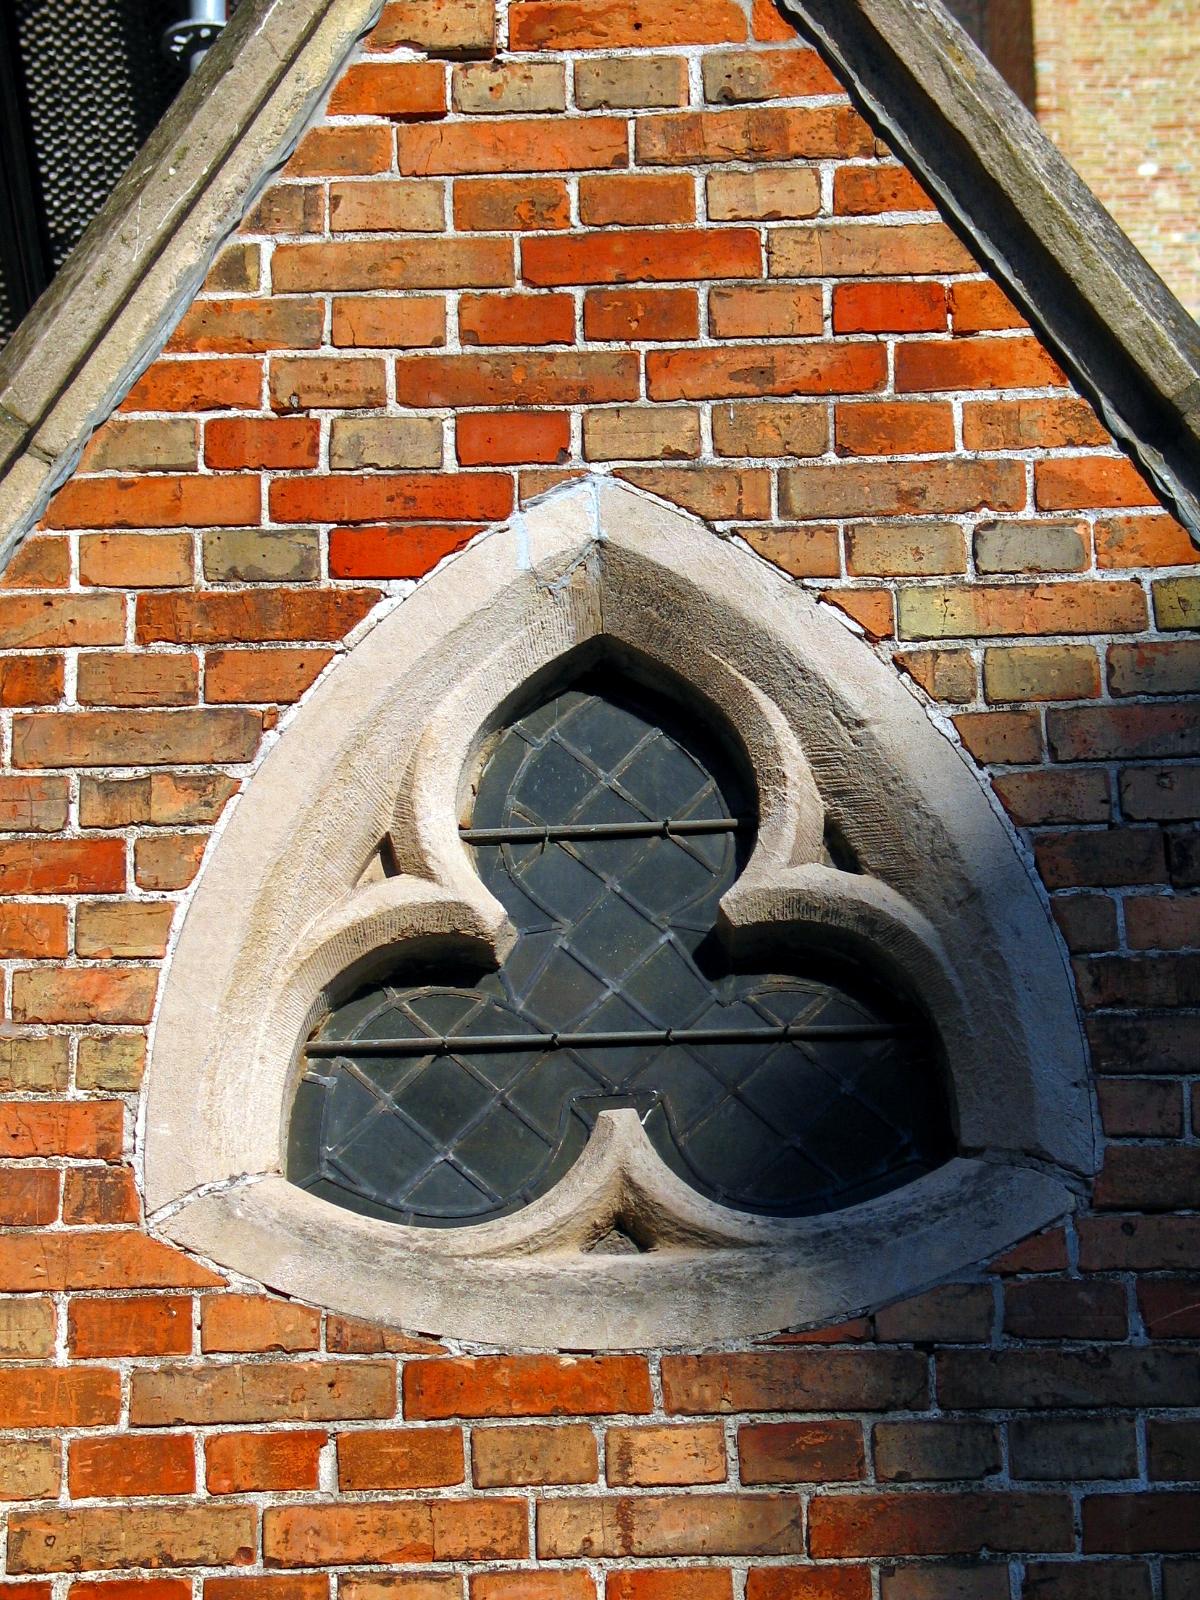 Reuleaux triangle shaped window of Sint-Salvatorskathedraal, Bruges.jpg